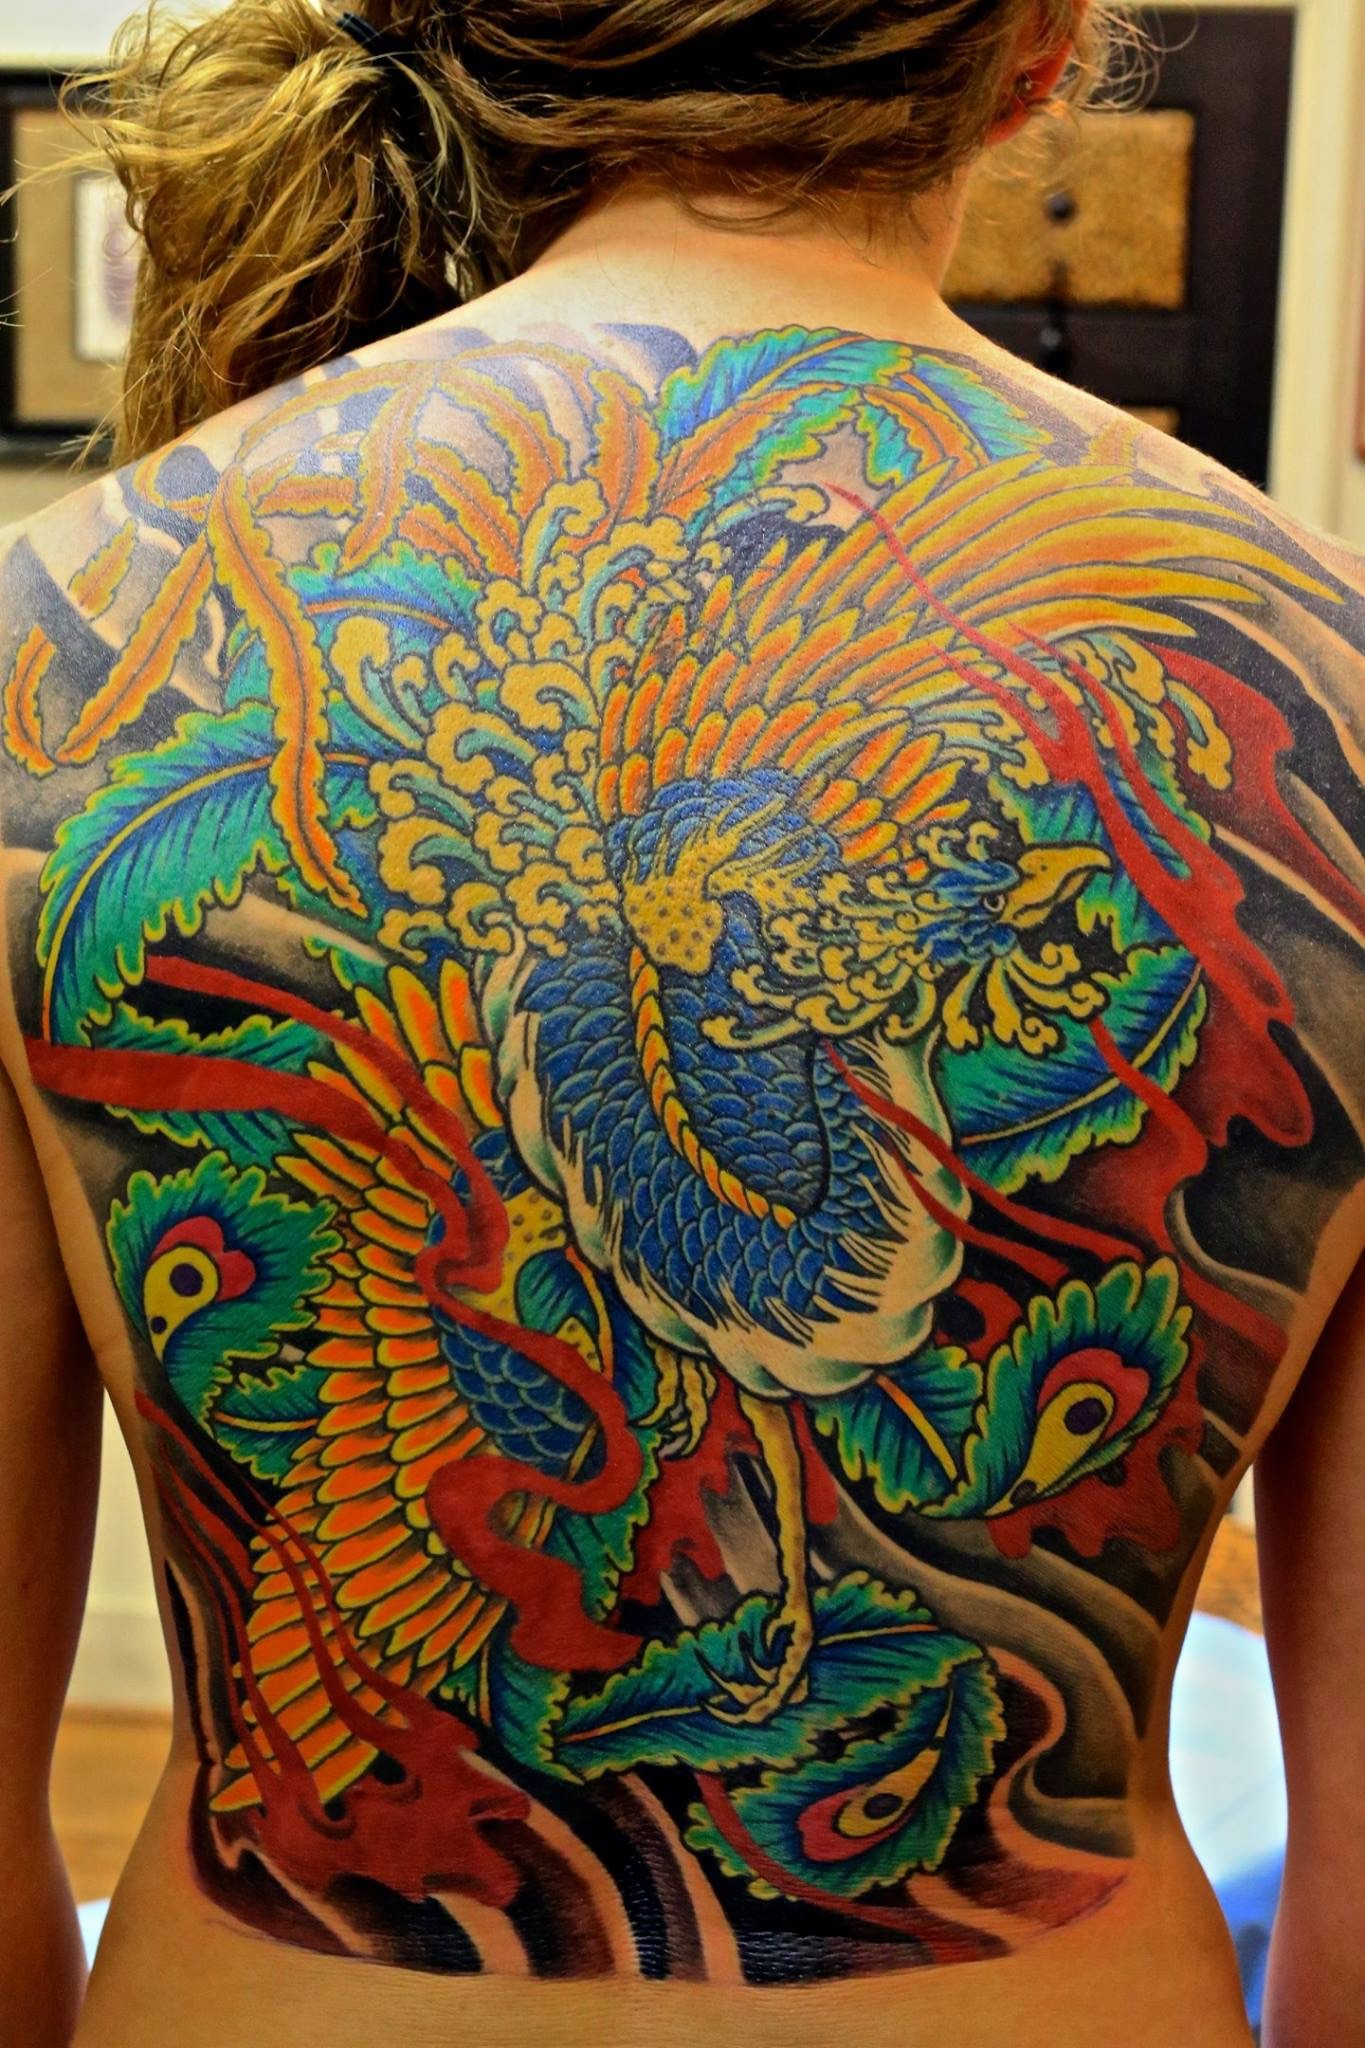 Piper tattoo asian portfolio exposed temptations for Tattoo shops in northern va